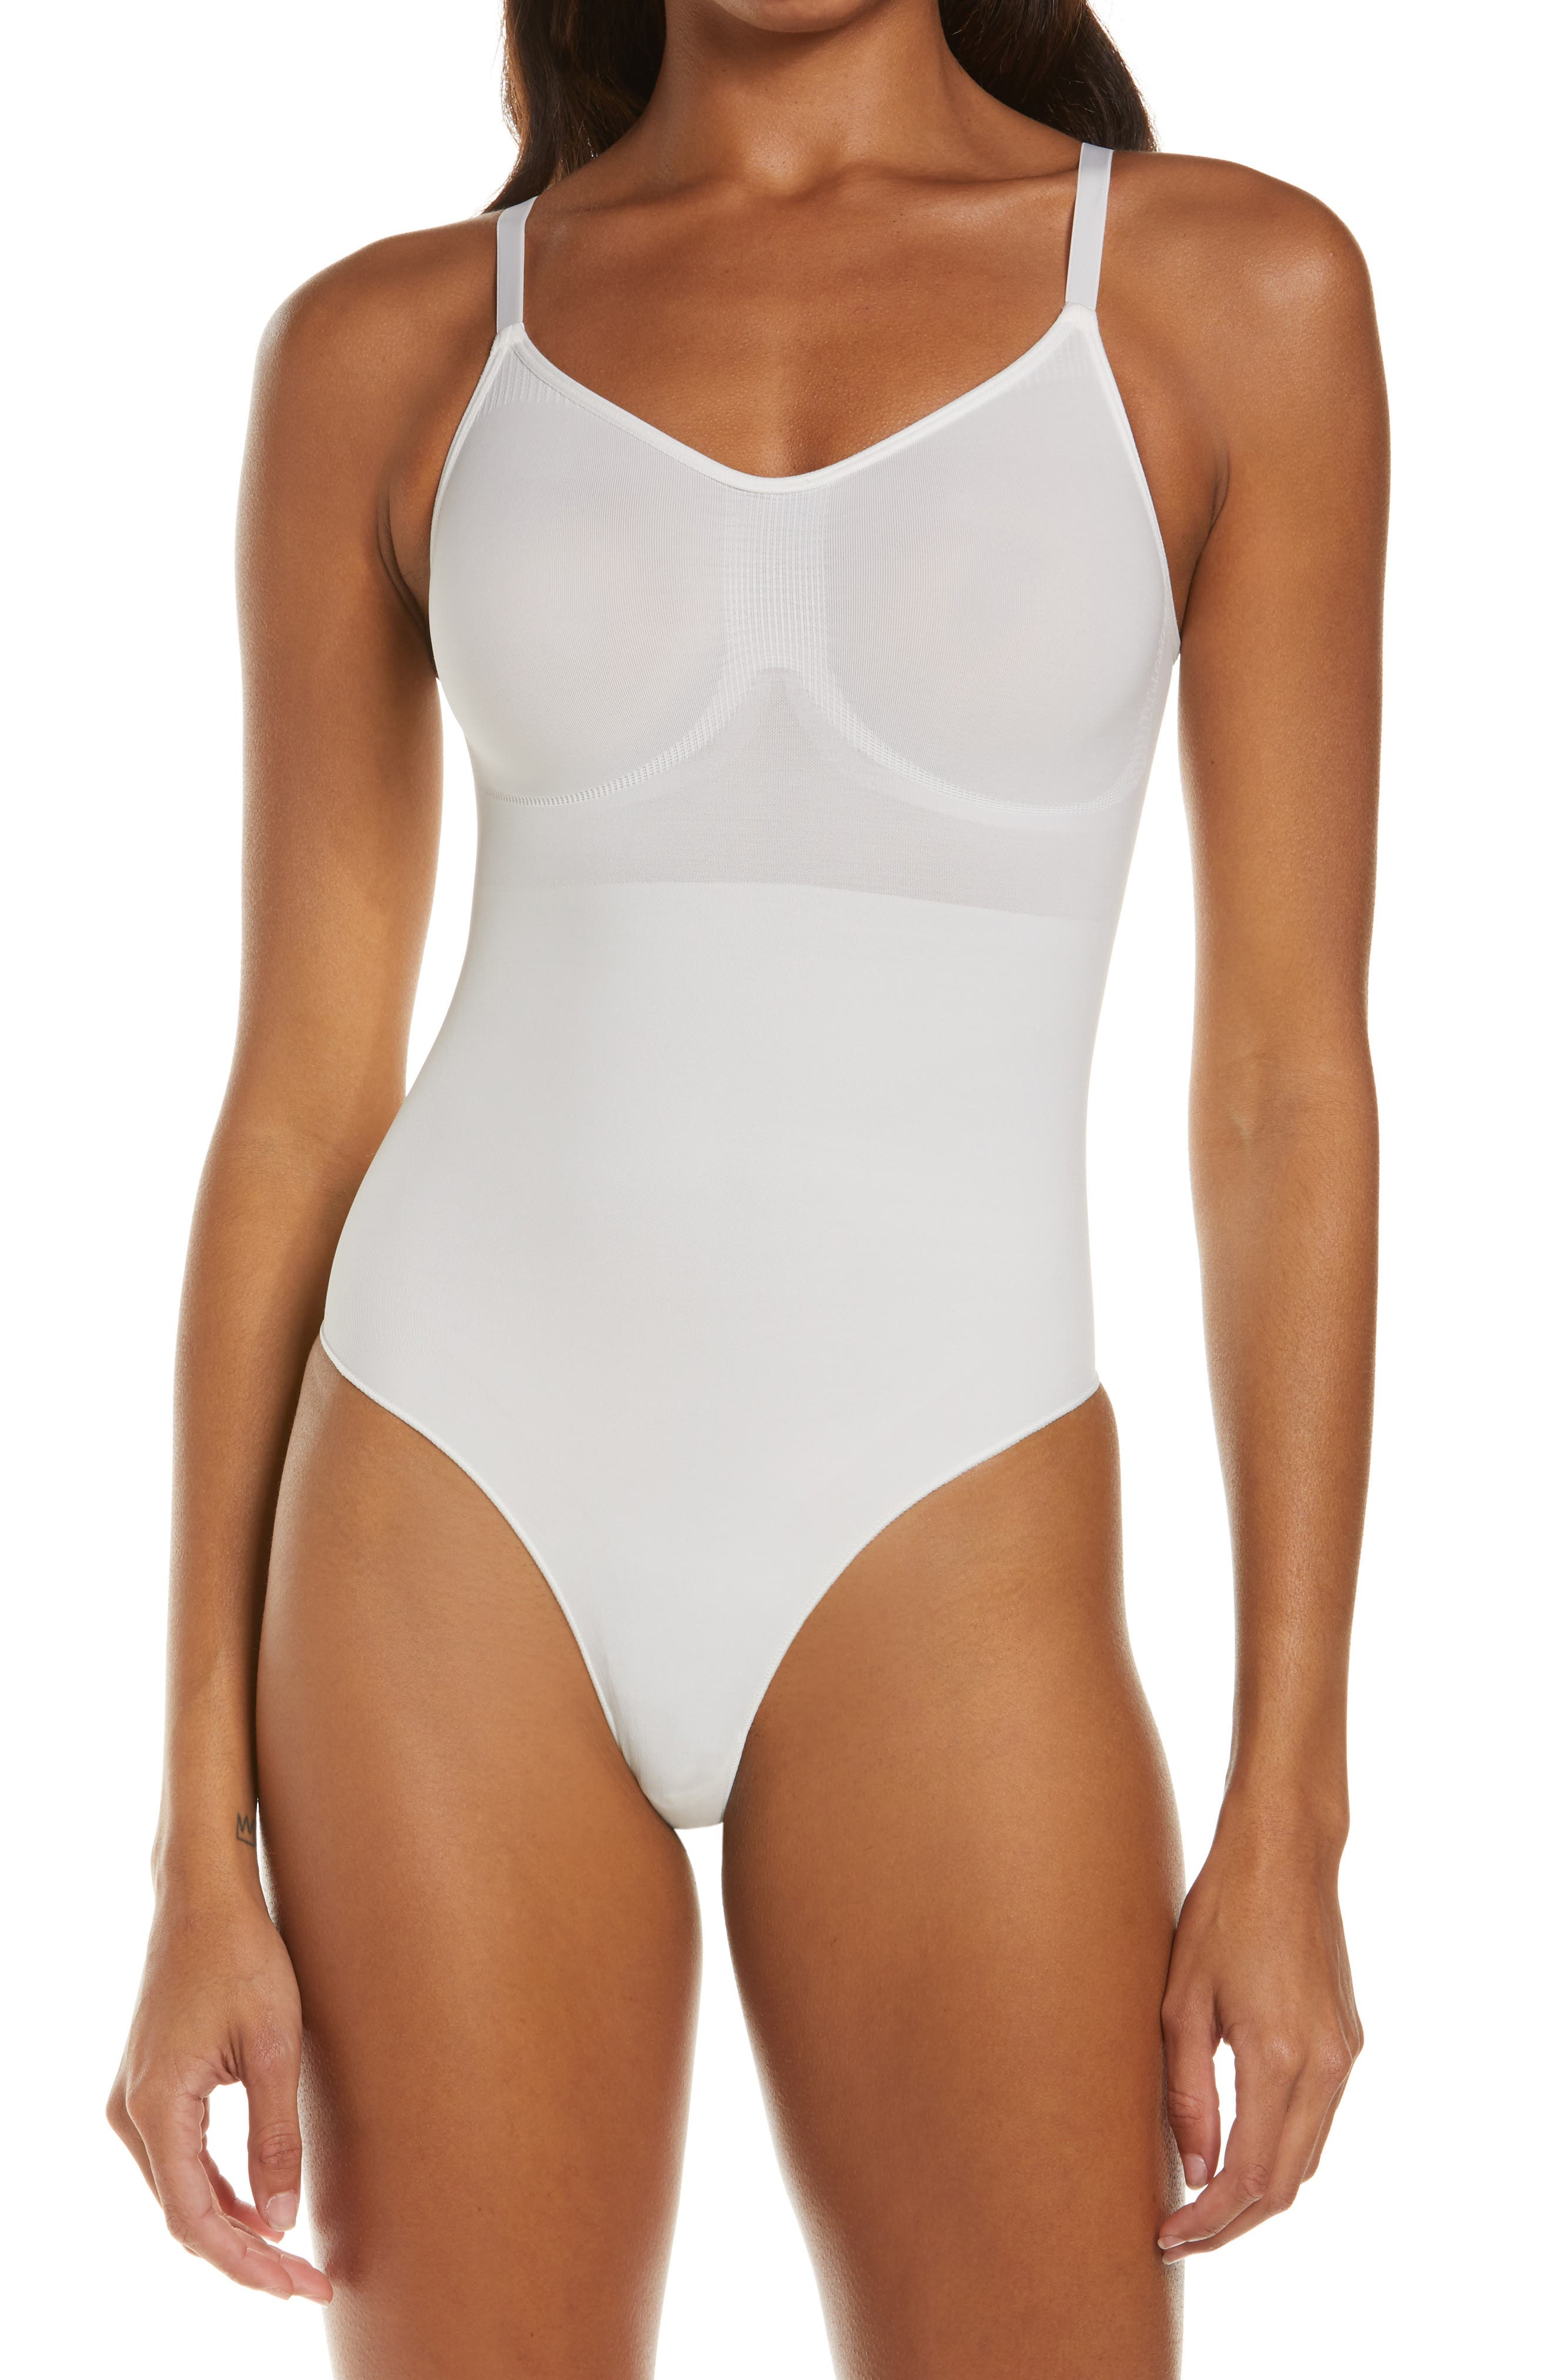 white bodysuit size 42c